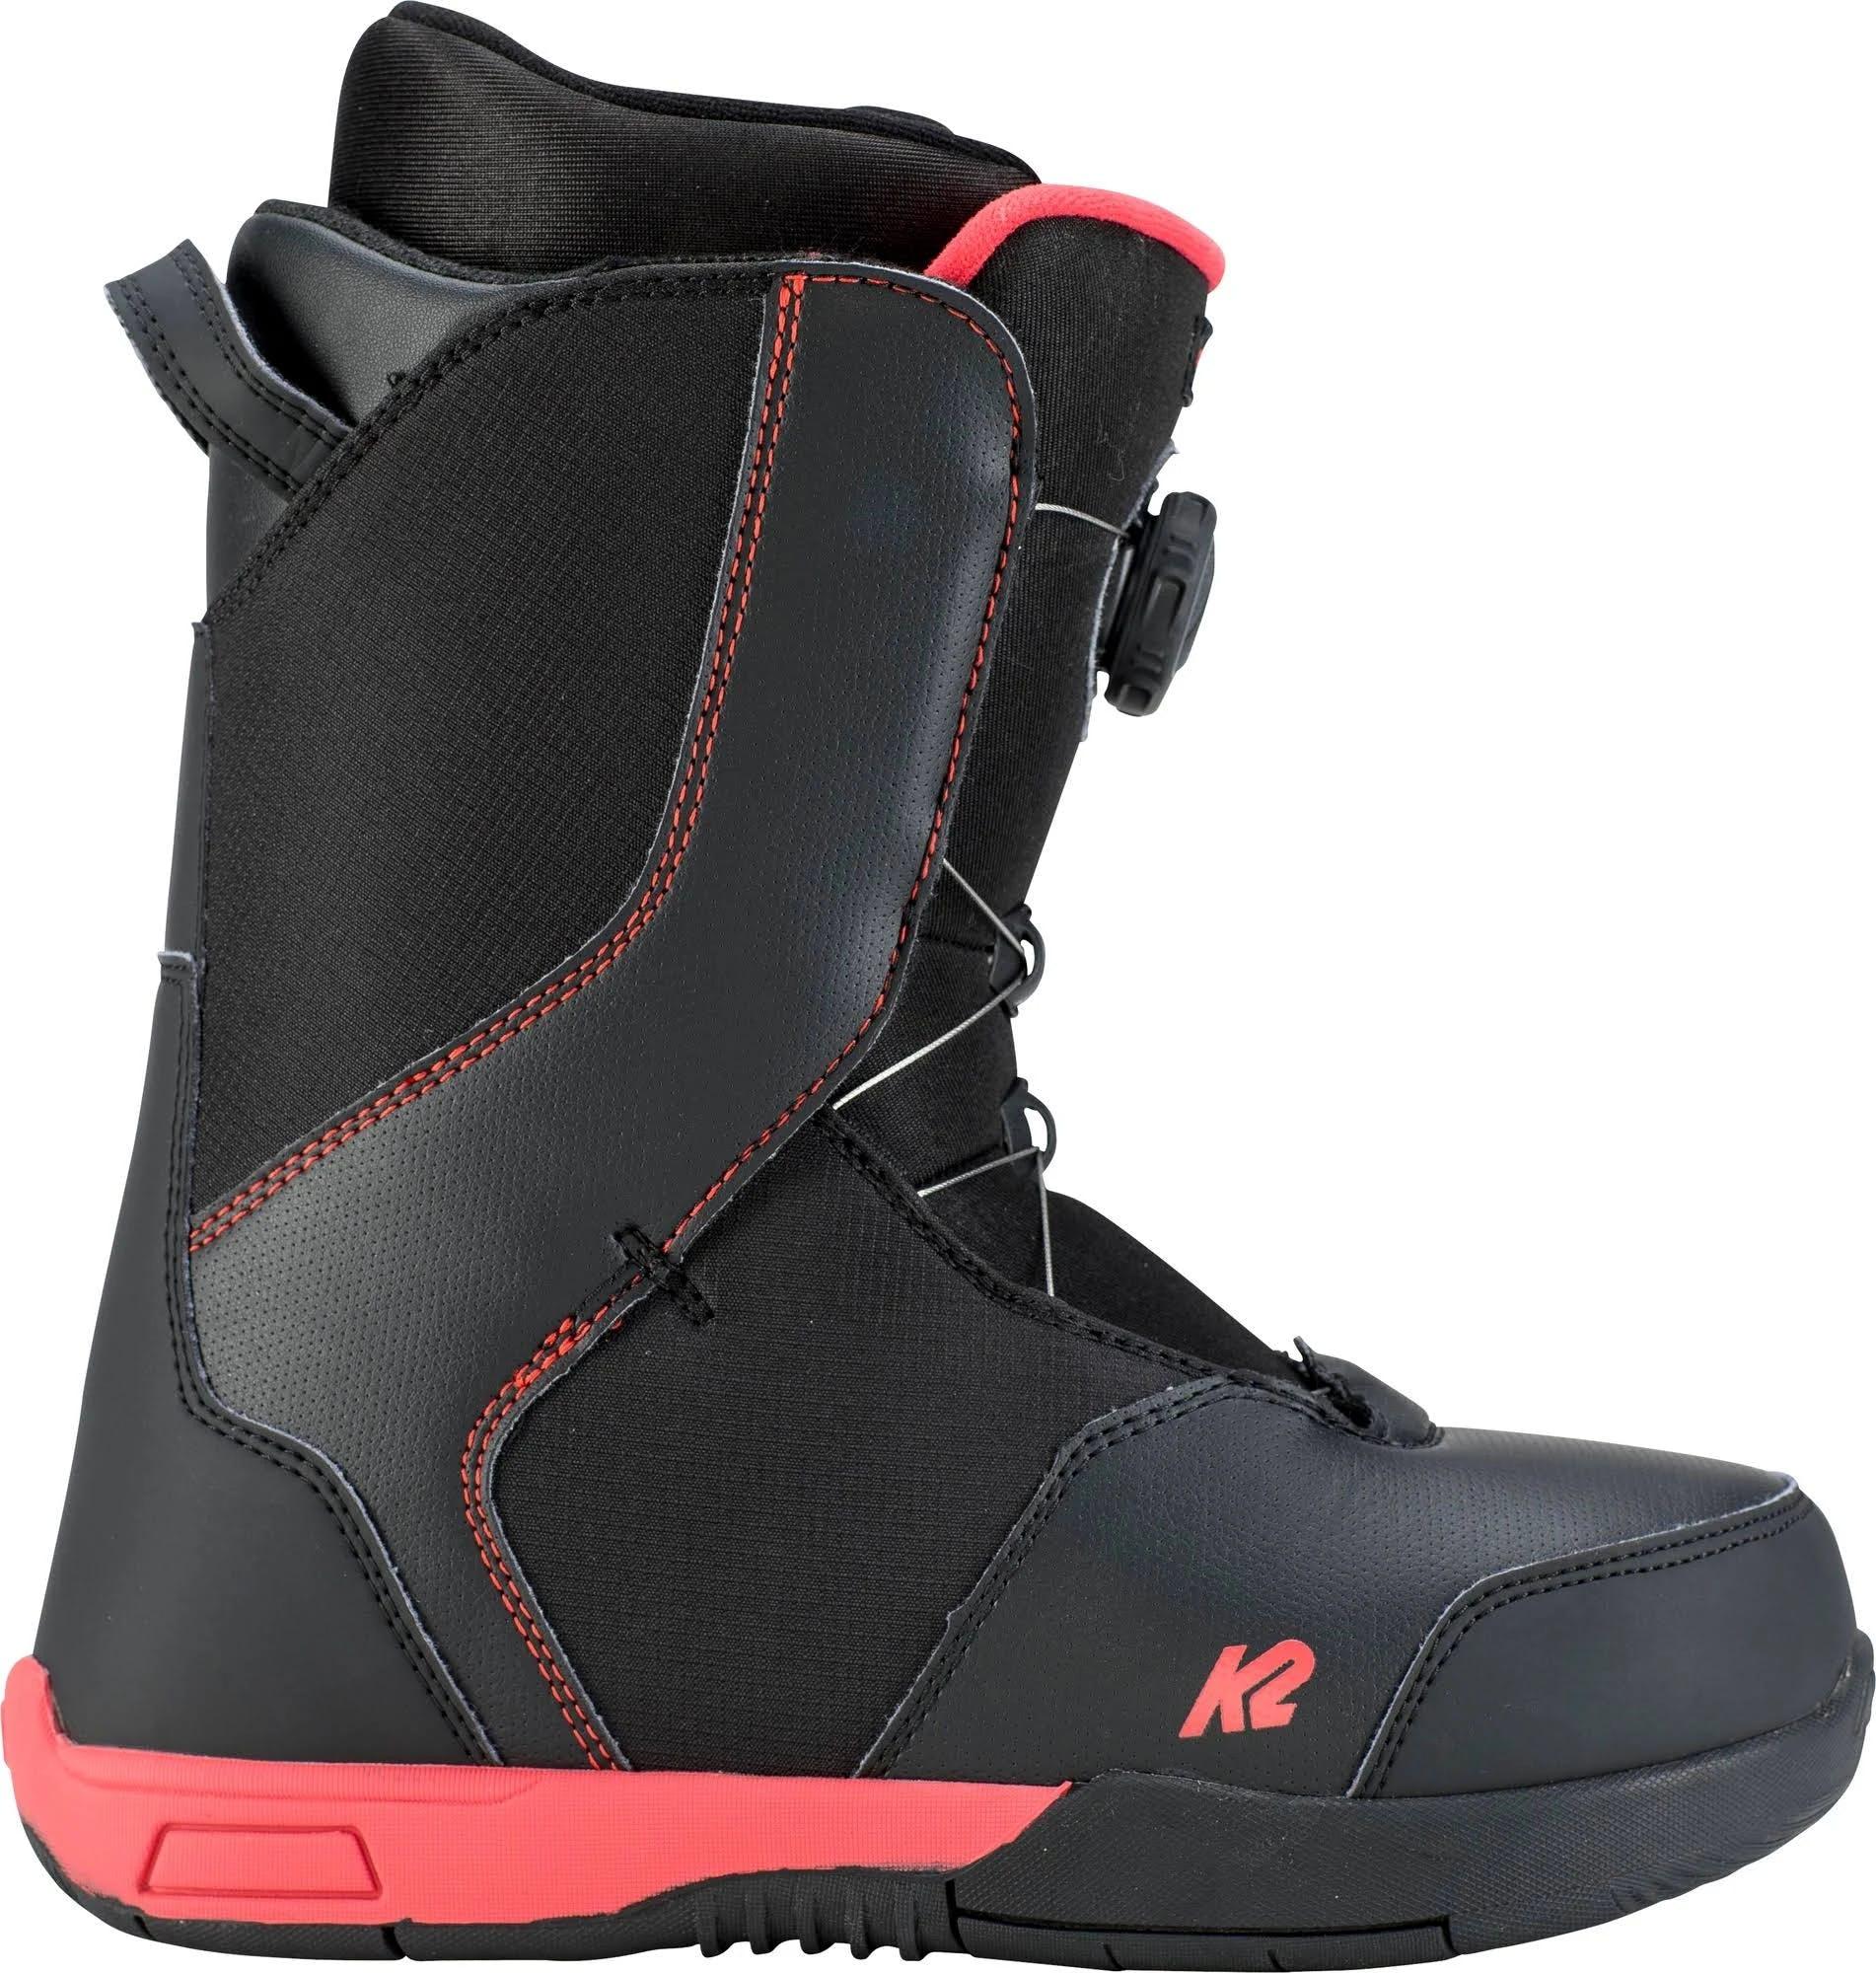 K2 Vandal Snowboard Boots Kids' Black 5